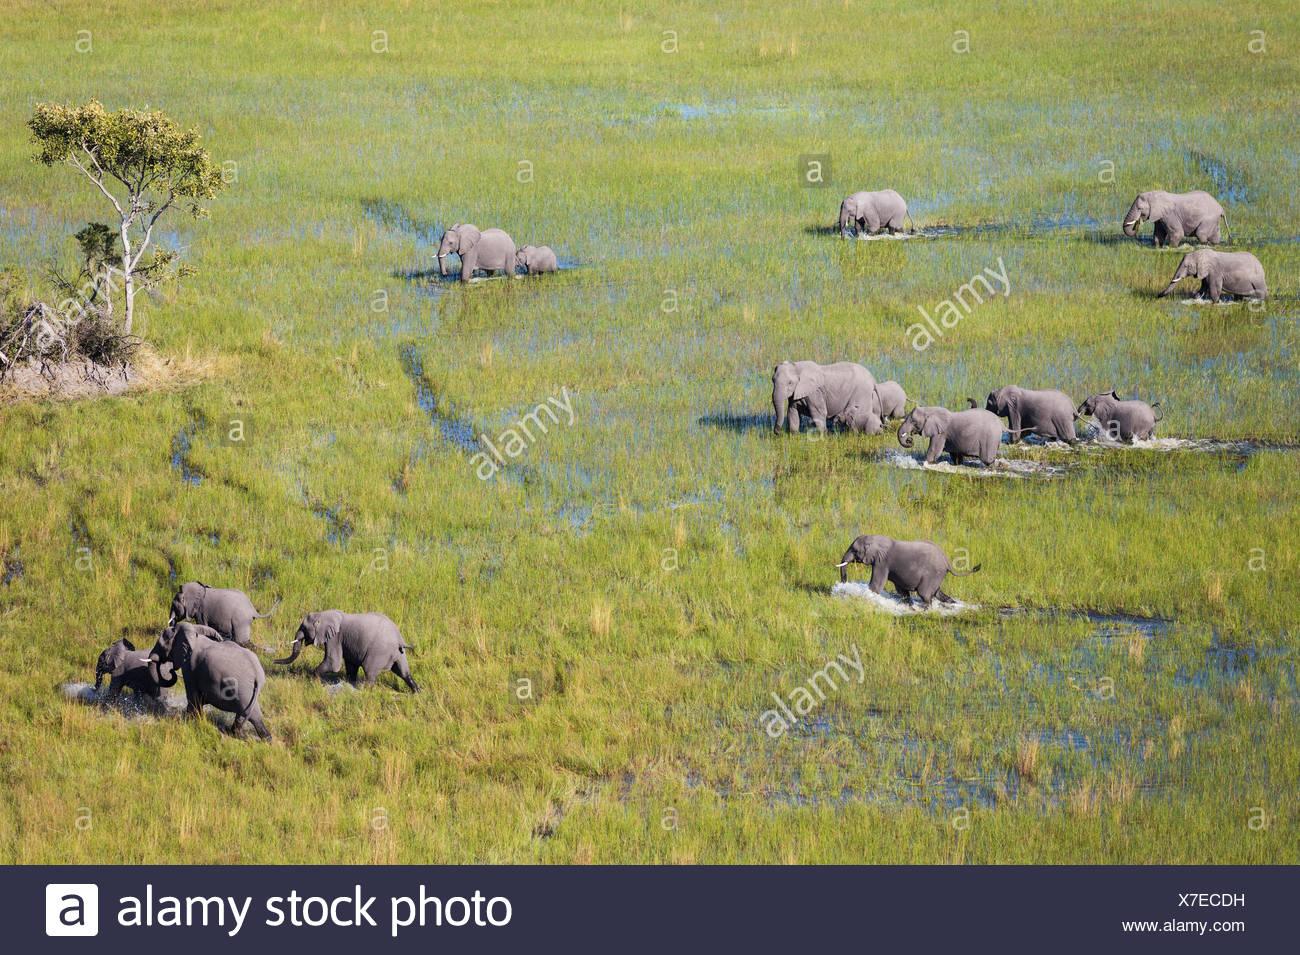 African Elephant (Loxodonta africana), breeding herd, roaming in a freshwater marsh, aerial view, Okavango Delta - Stock Image